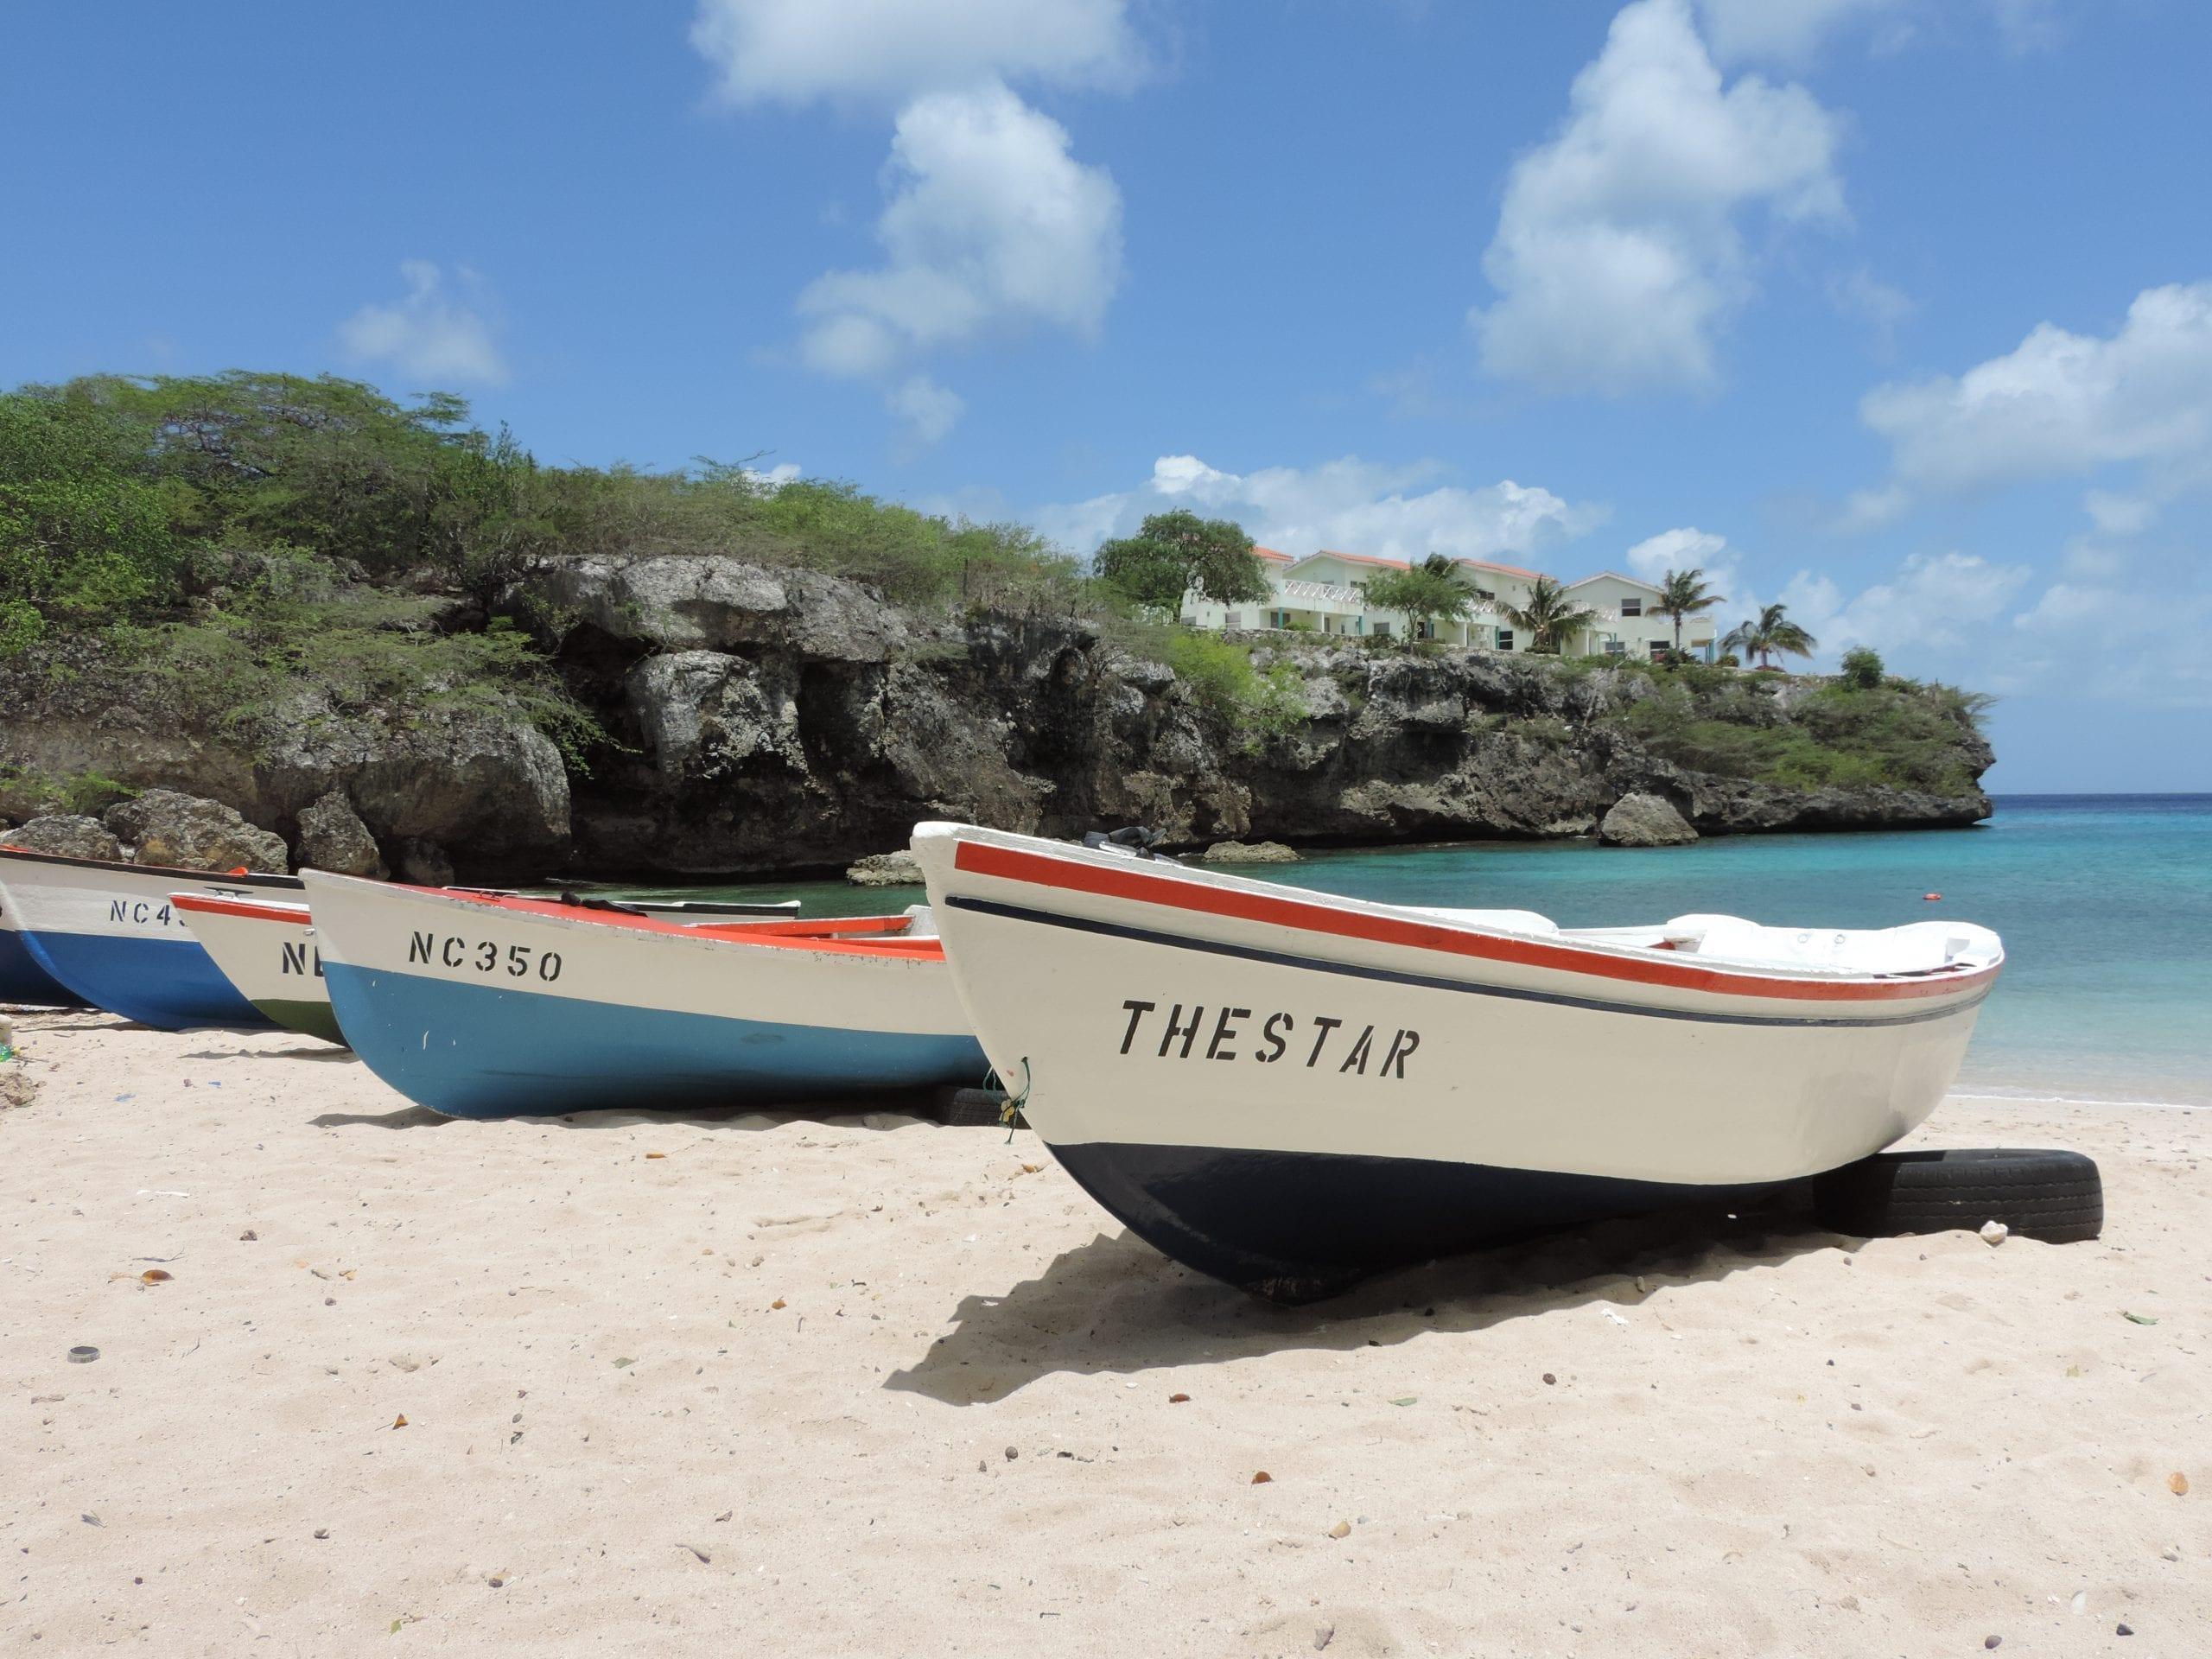 Strandje op Curacao